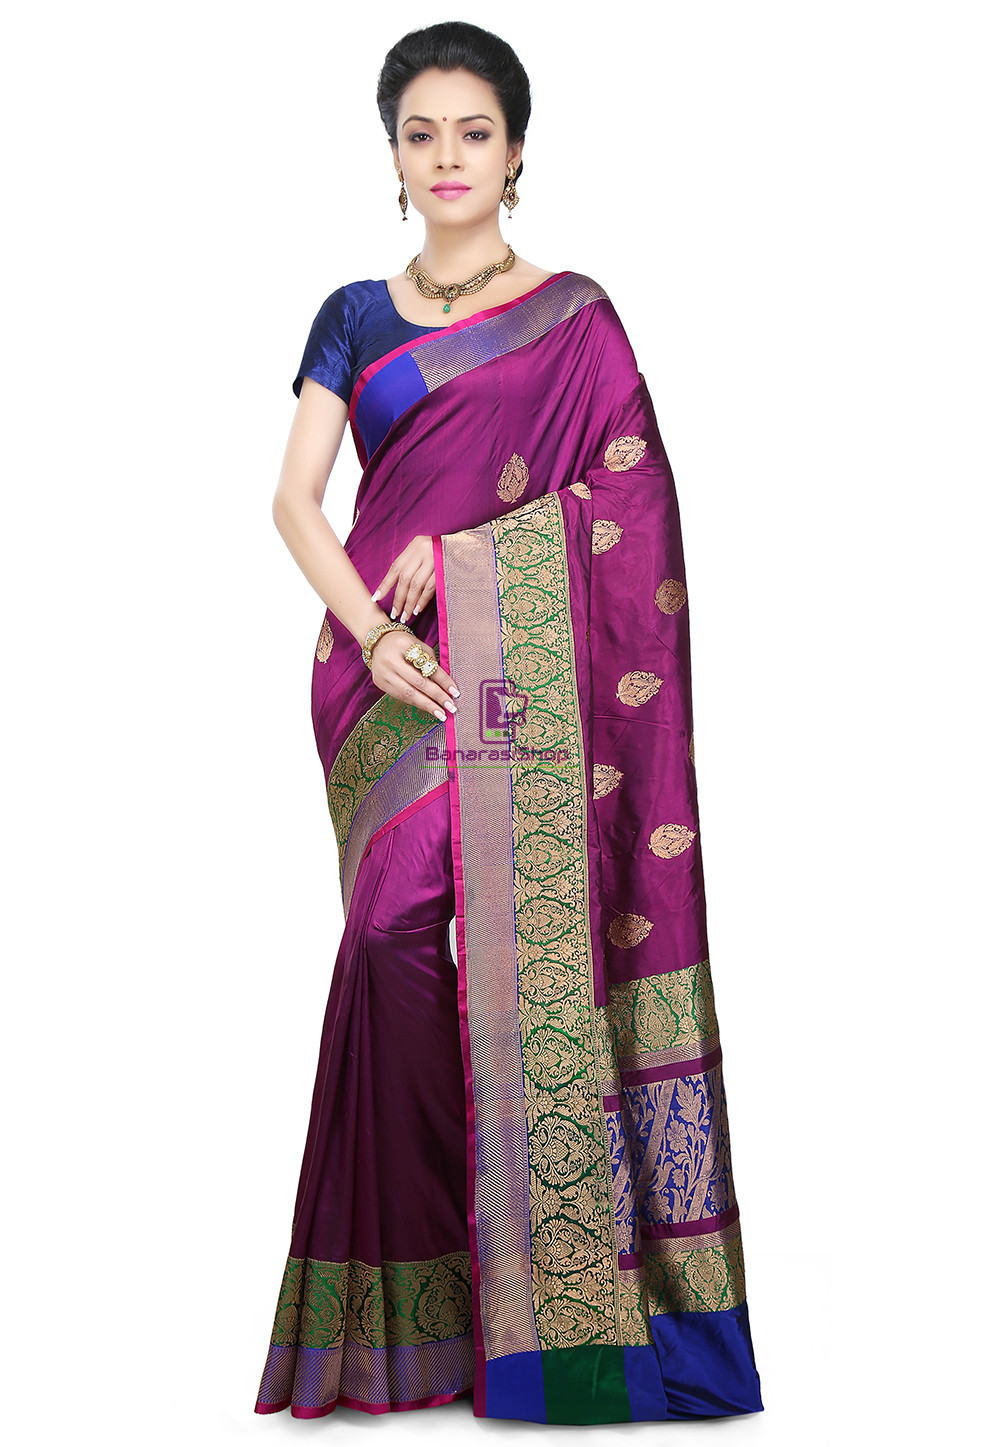 Banarasi Pure Katan Silk Handloom Saree in Purple 1